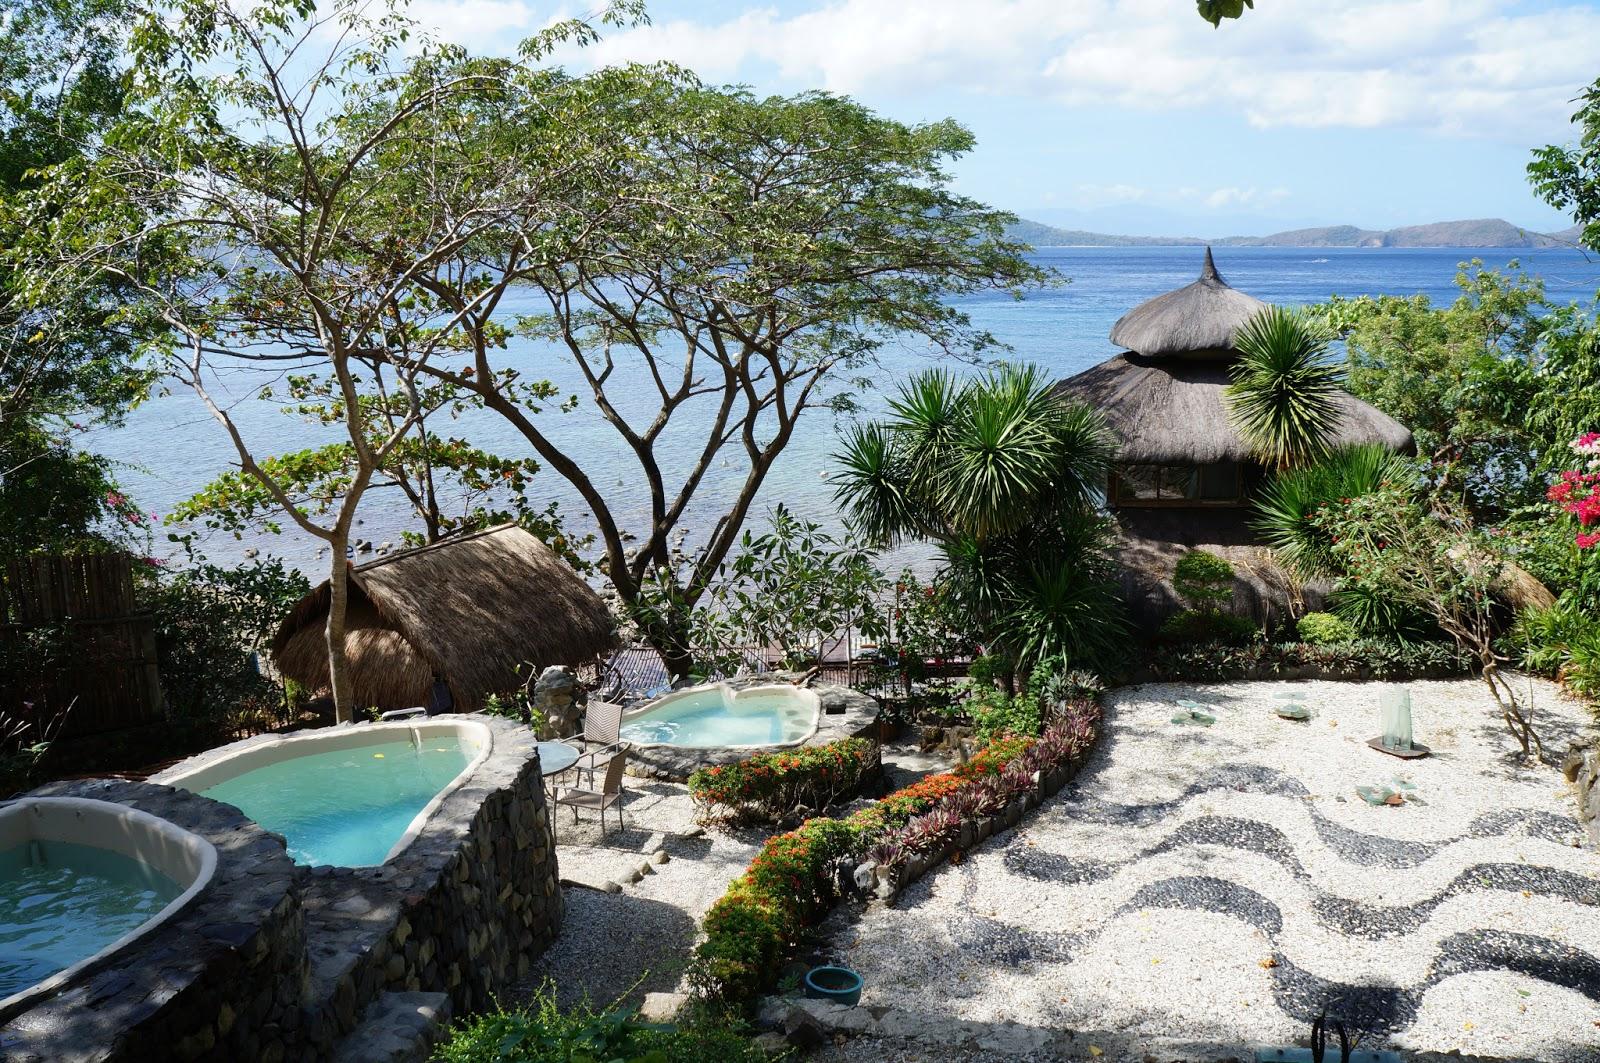 Casita Ysabel A Paradise Weekend Getaway In Mabini